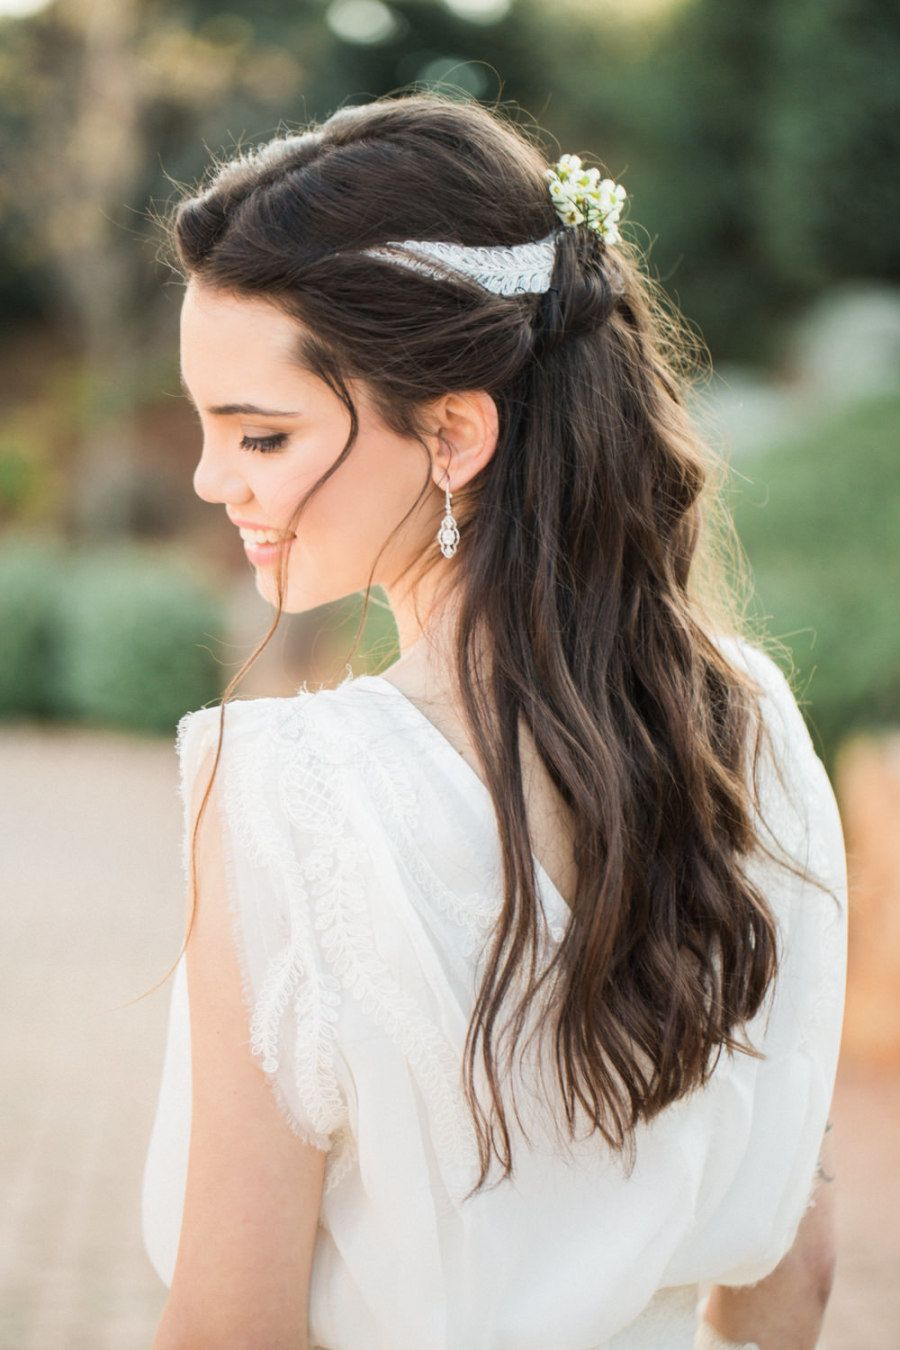 dress - Goddess greek wedding hair video